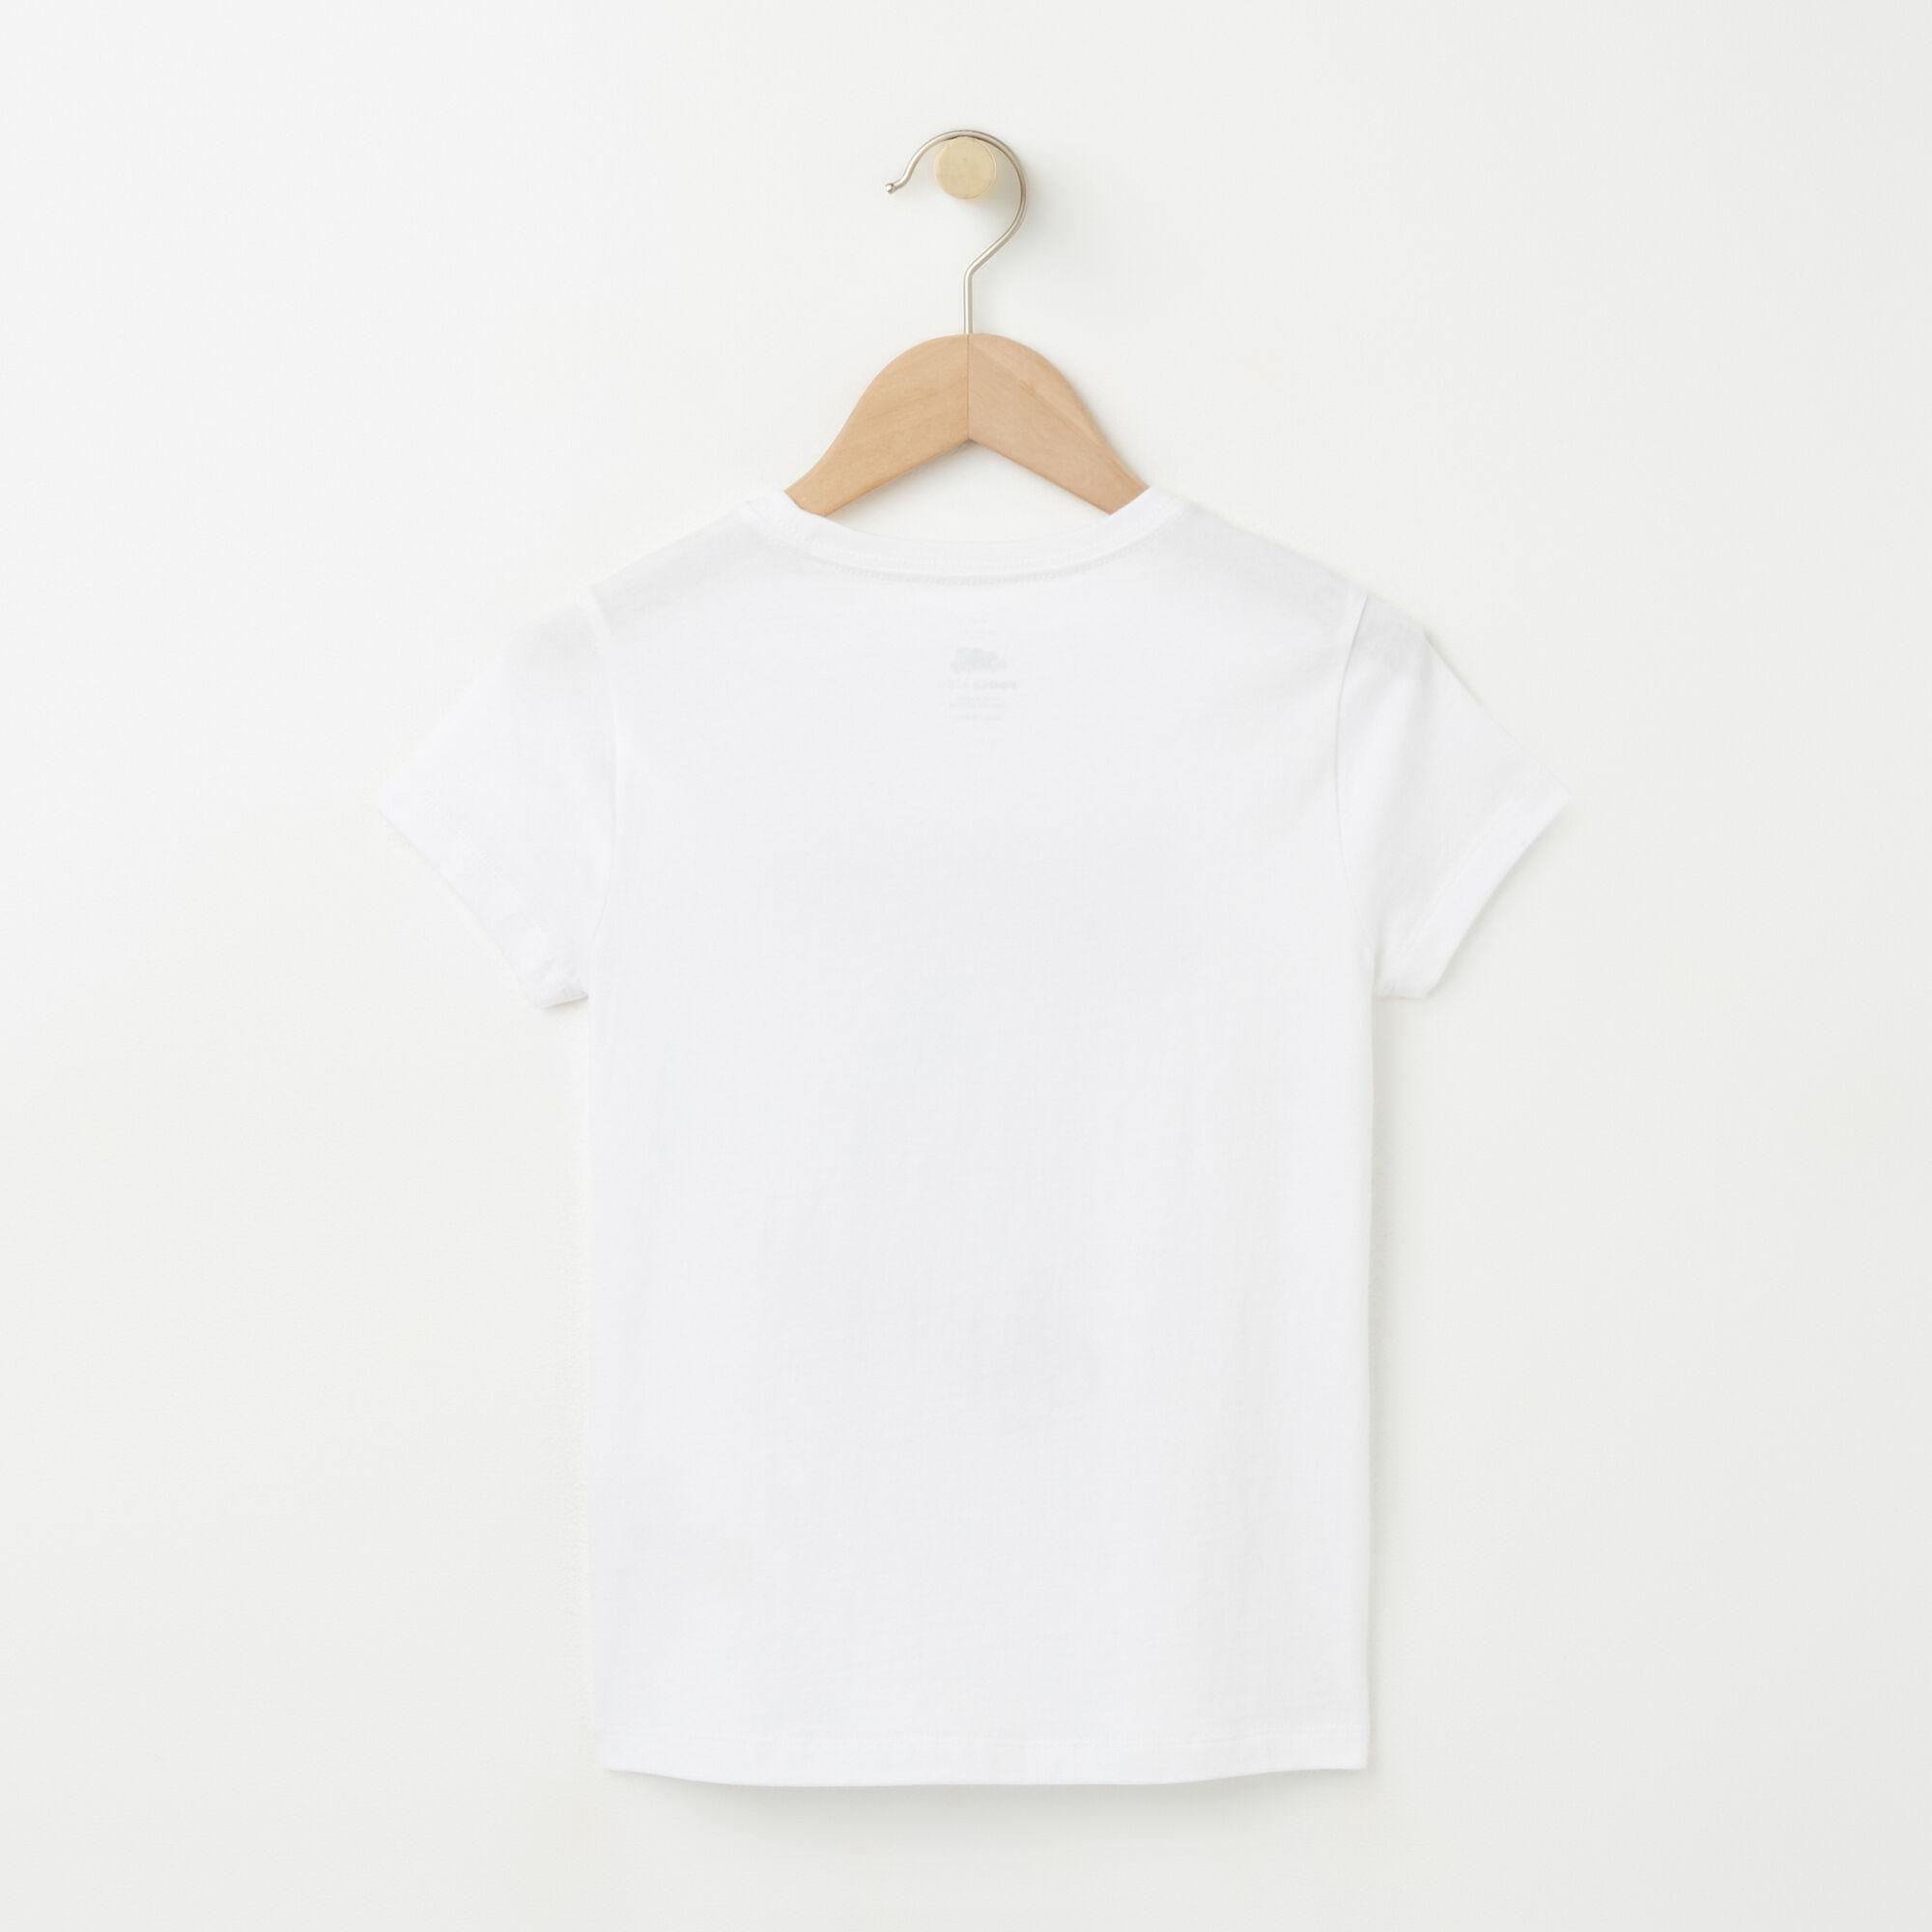 Filles T-shirt Sirop D'érable